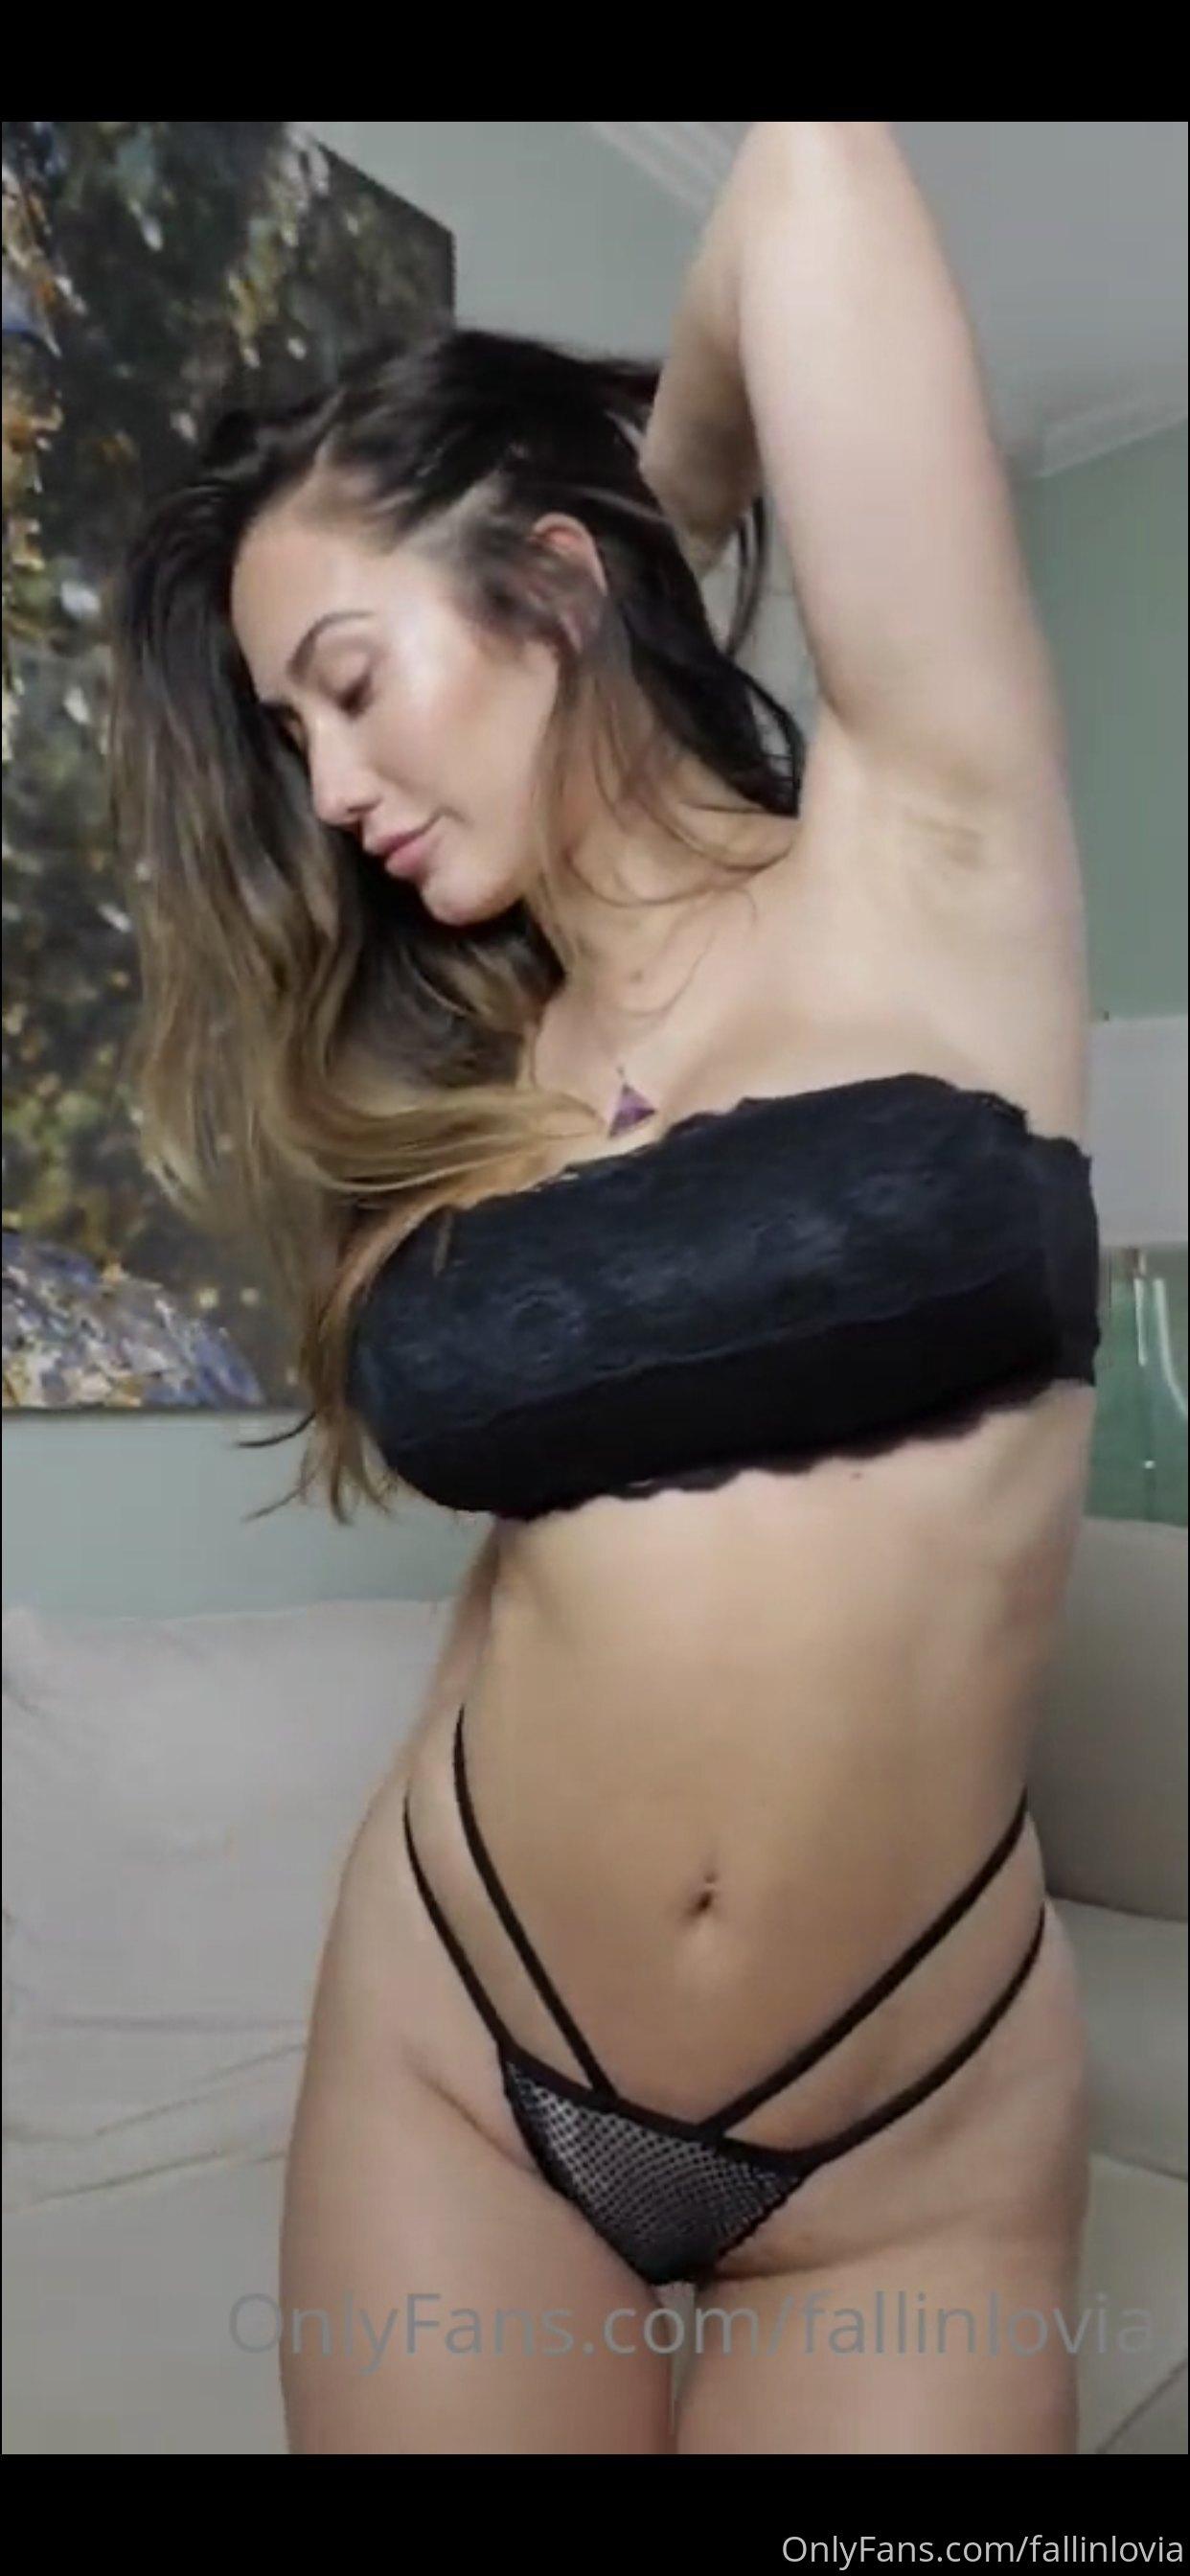 Eva Lovia, Fallinlovia, Onlyfans 0128